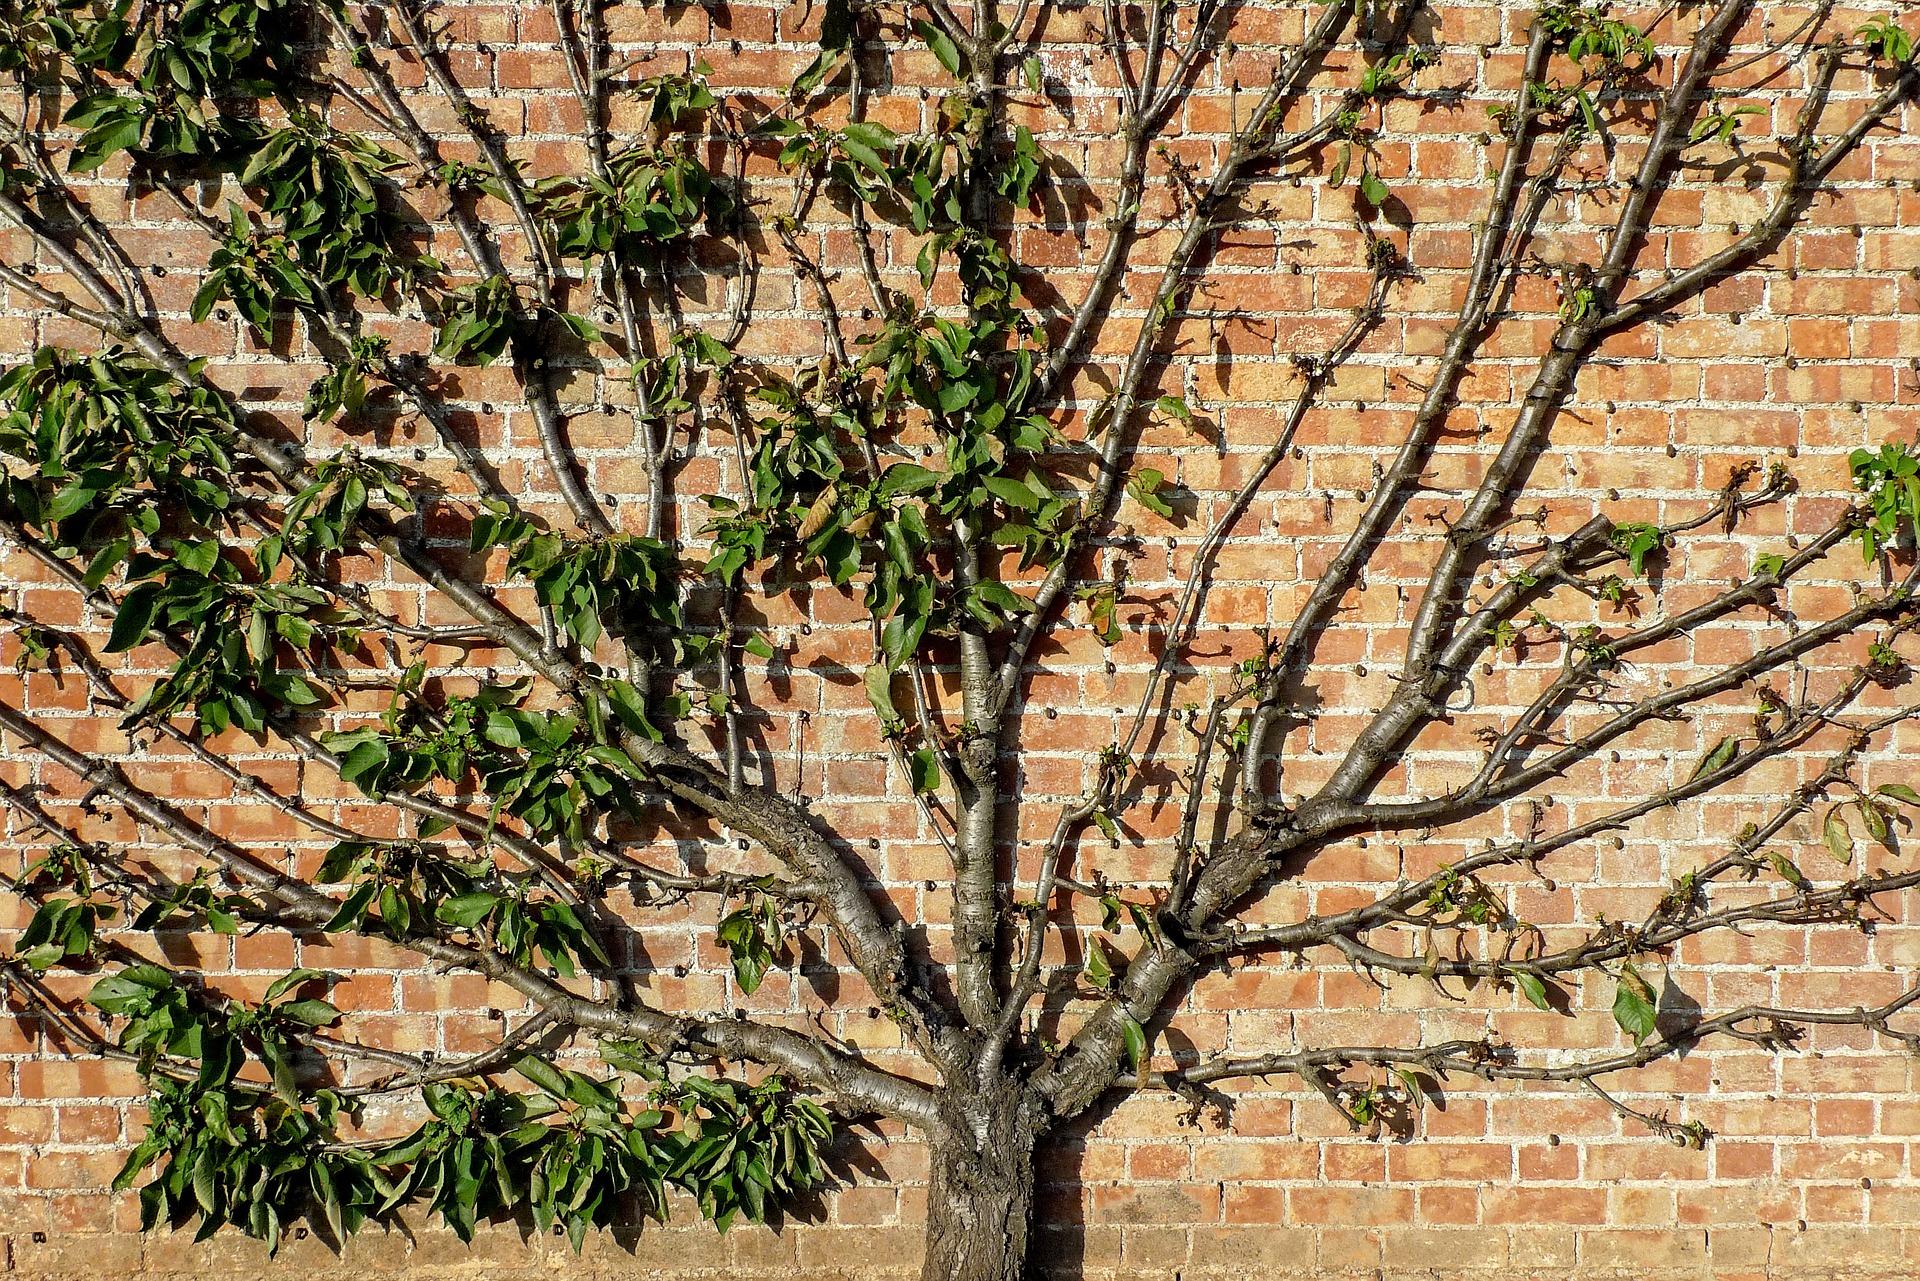 tree-1706648_1920